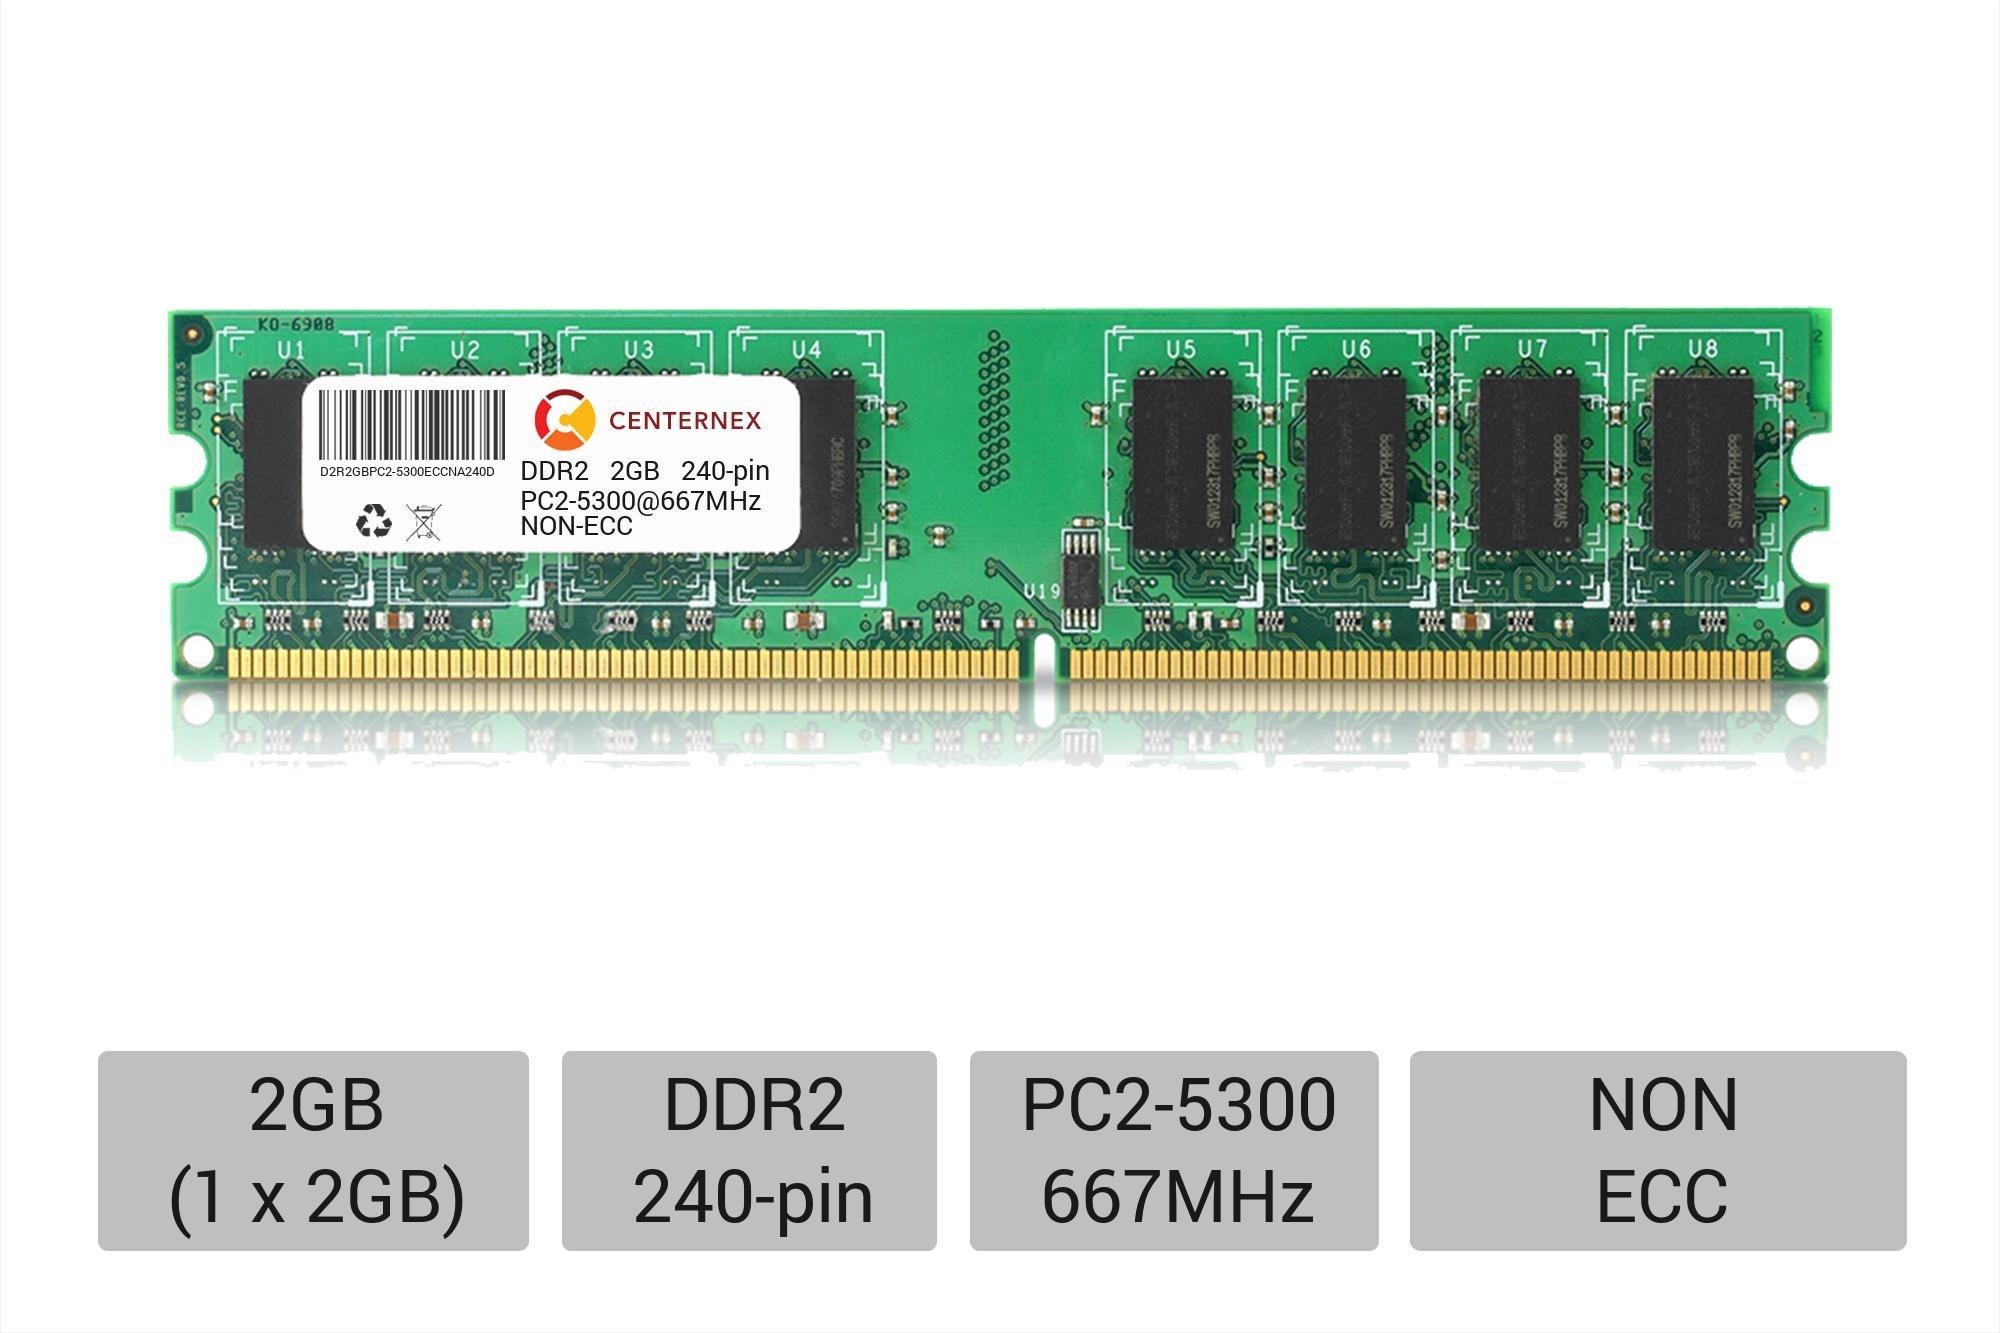 2GB DIMM Evesham Solar Quattro GTX SX100 SX500 Ultimate GT VX Ram Memory by CENTERNEX